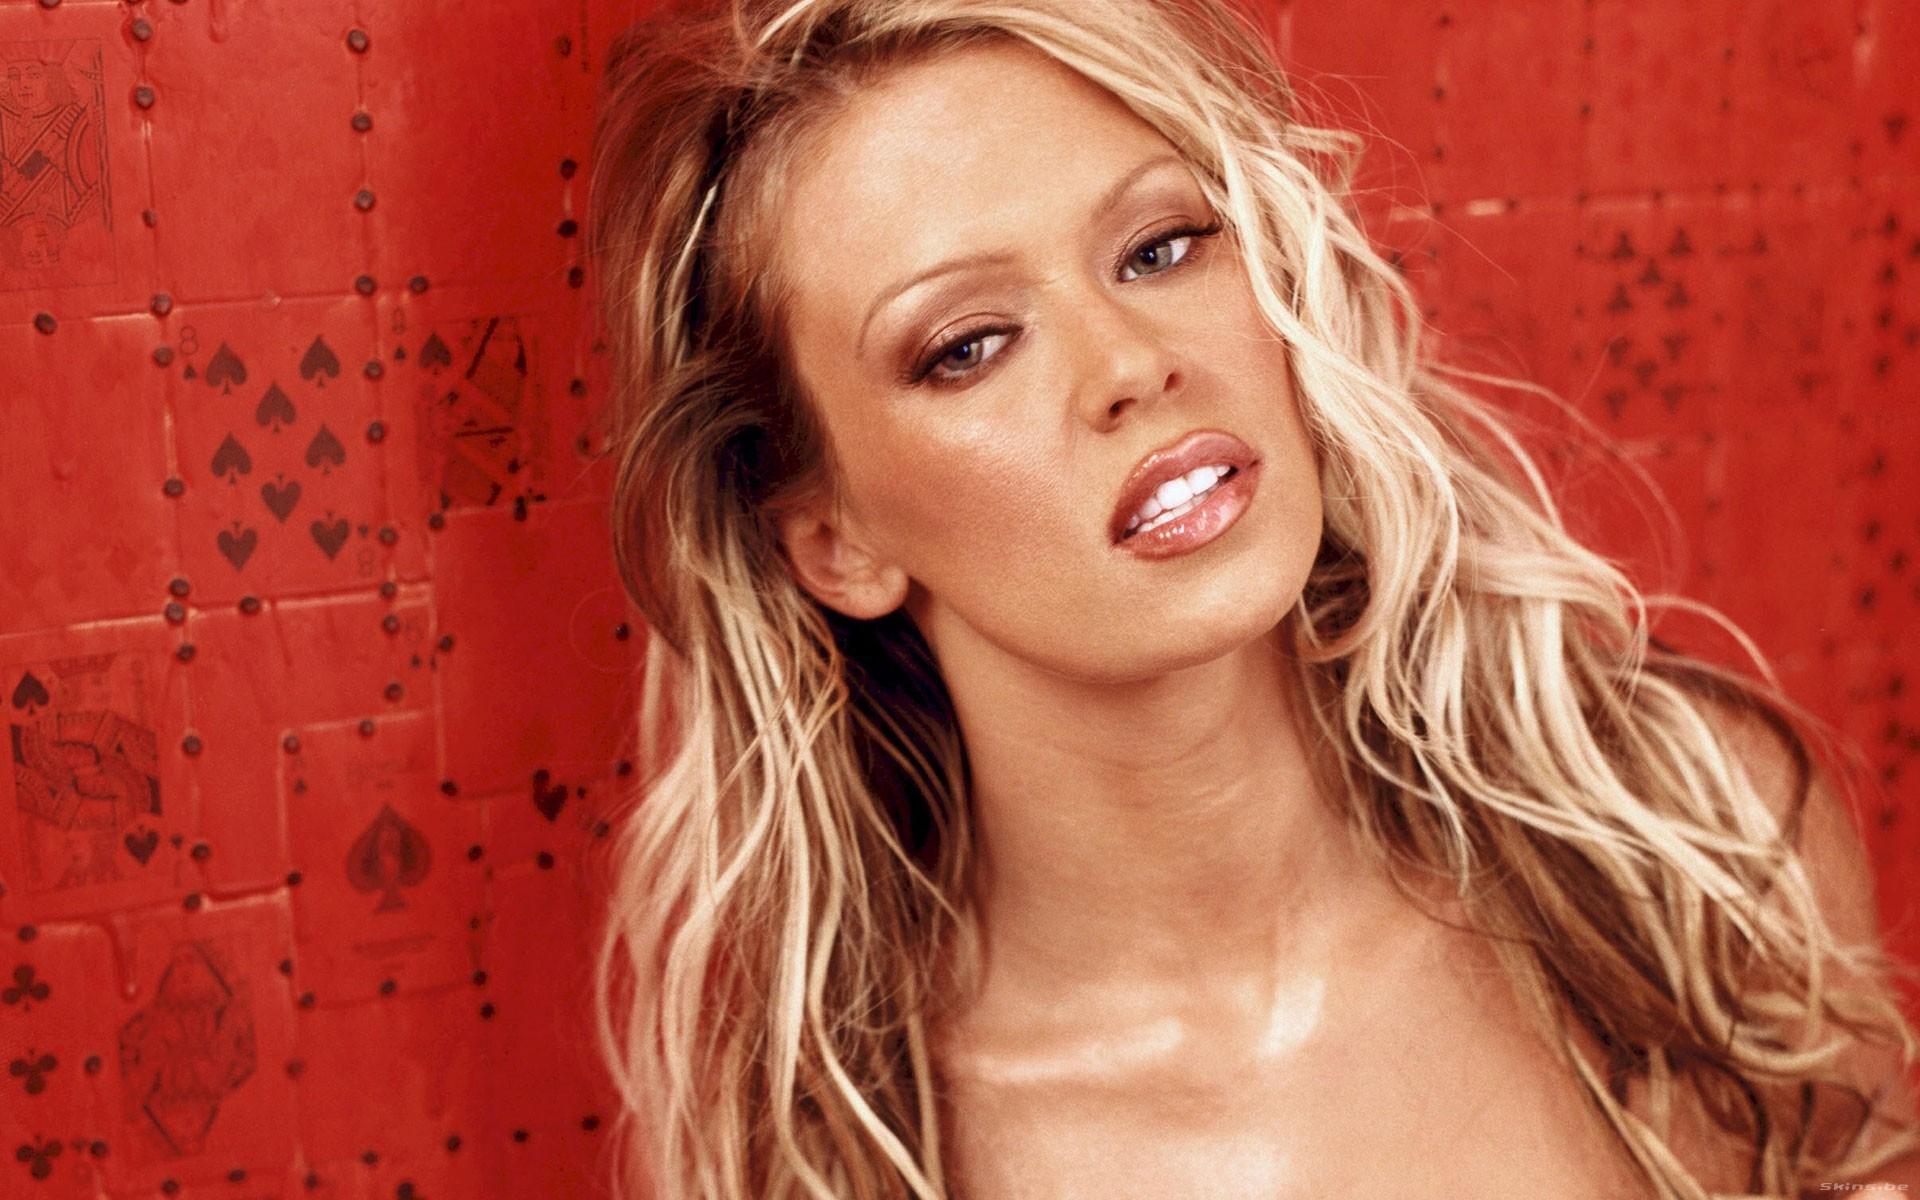 Jenna dickerson, snapchat nude jailbait